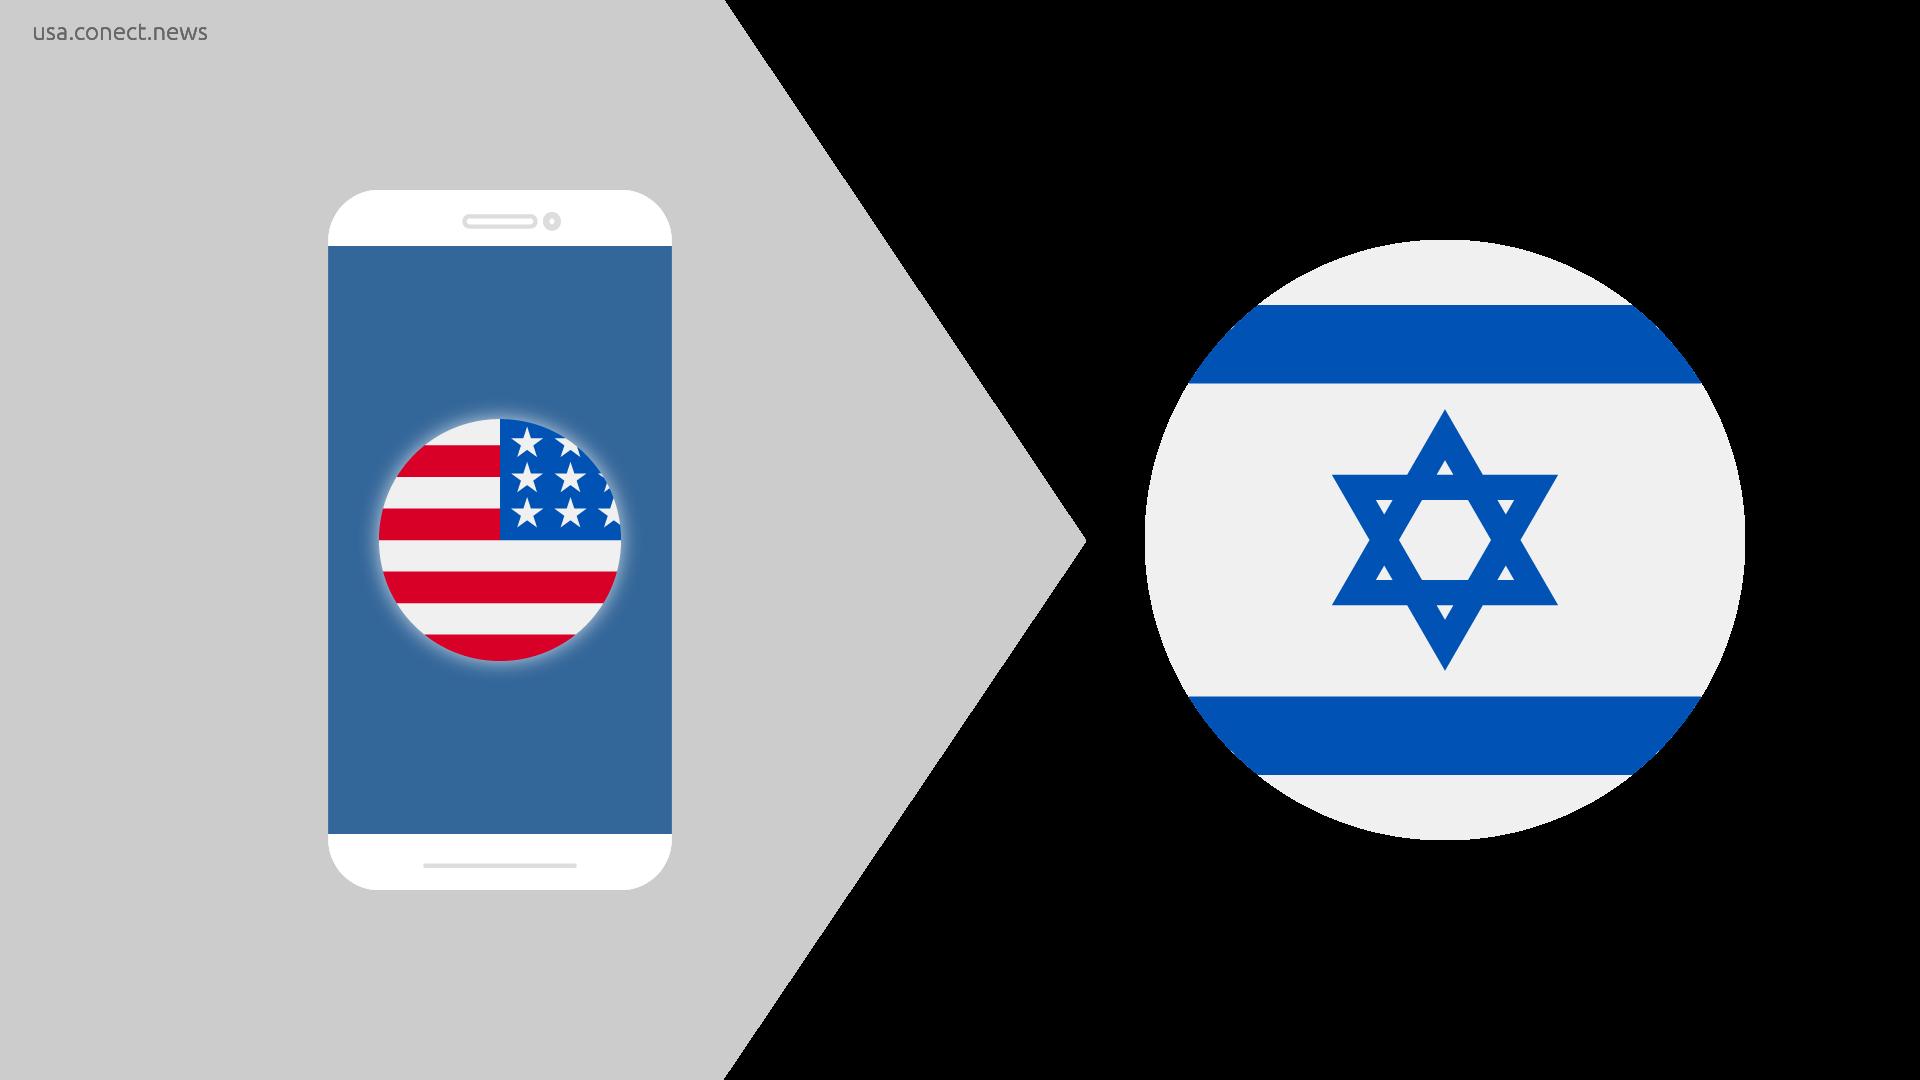 USA_Israel_@conect_news